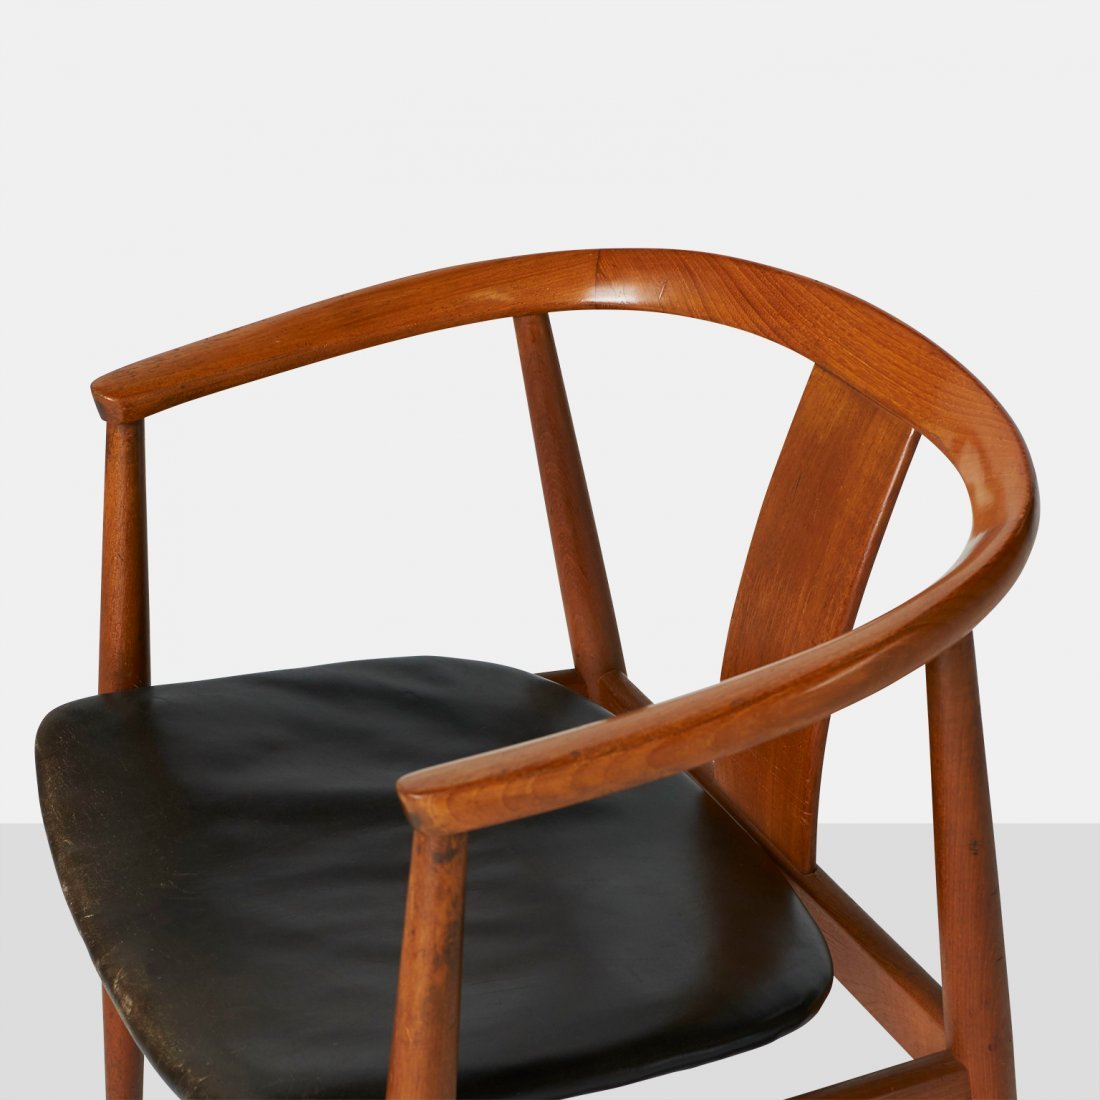 Tove & Edvard Kindt-Larsen, Lounge Chair - 2